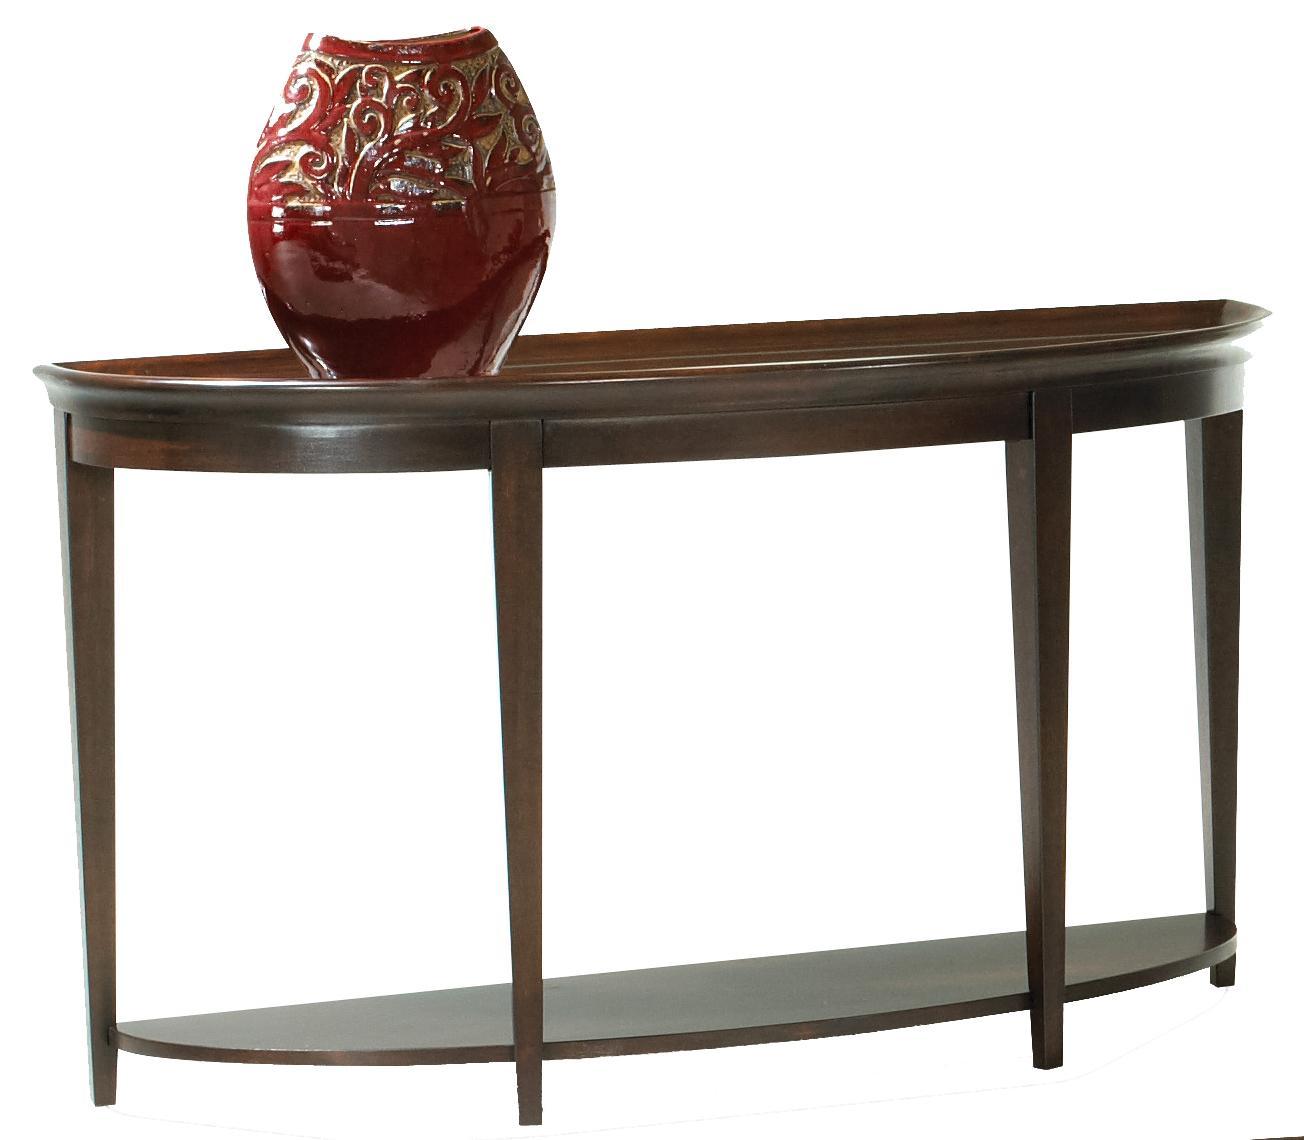 Klaussner International Omni Sofa Table - Item Number: 930-825